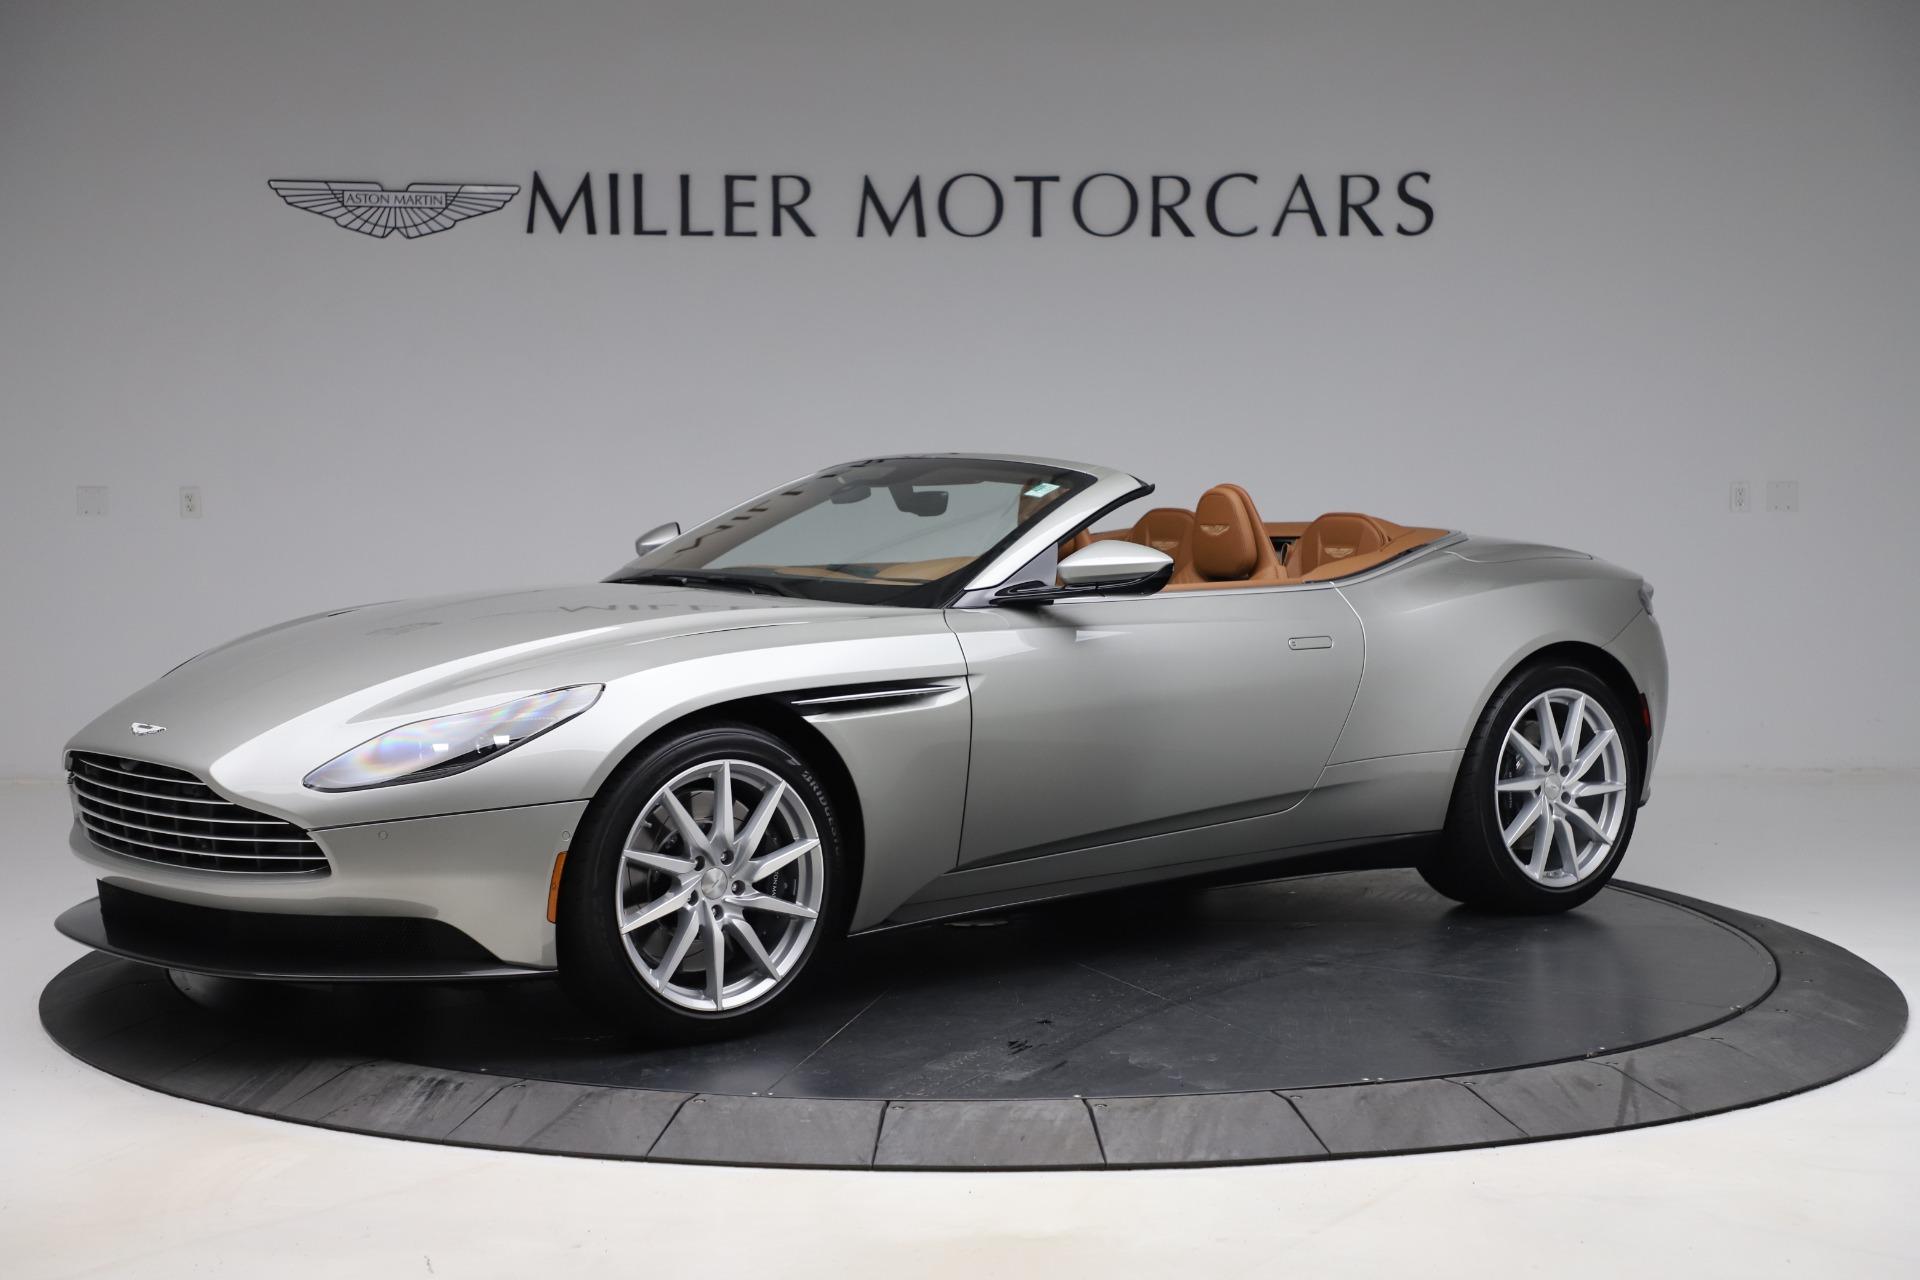 Used 2020 Aston Martin DB11 Volante Convertible for sale $239,900 at Maserati of Greenwich in Greenwich CT 06830 1